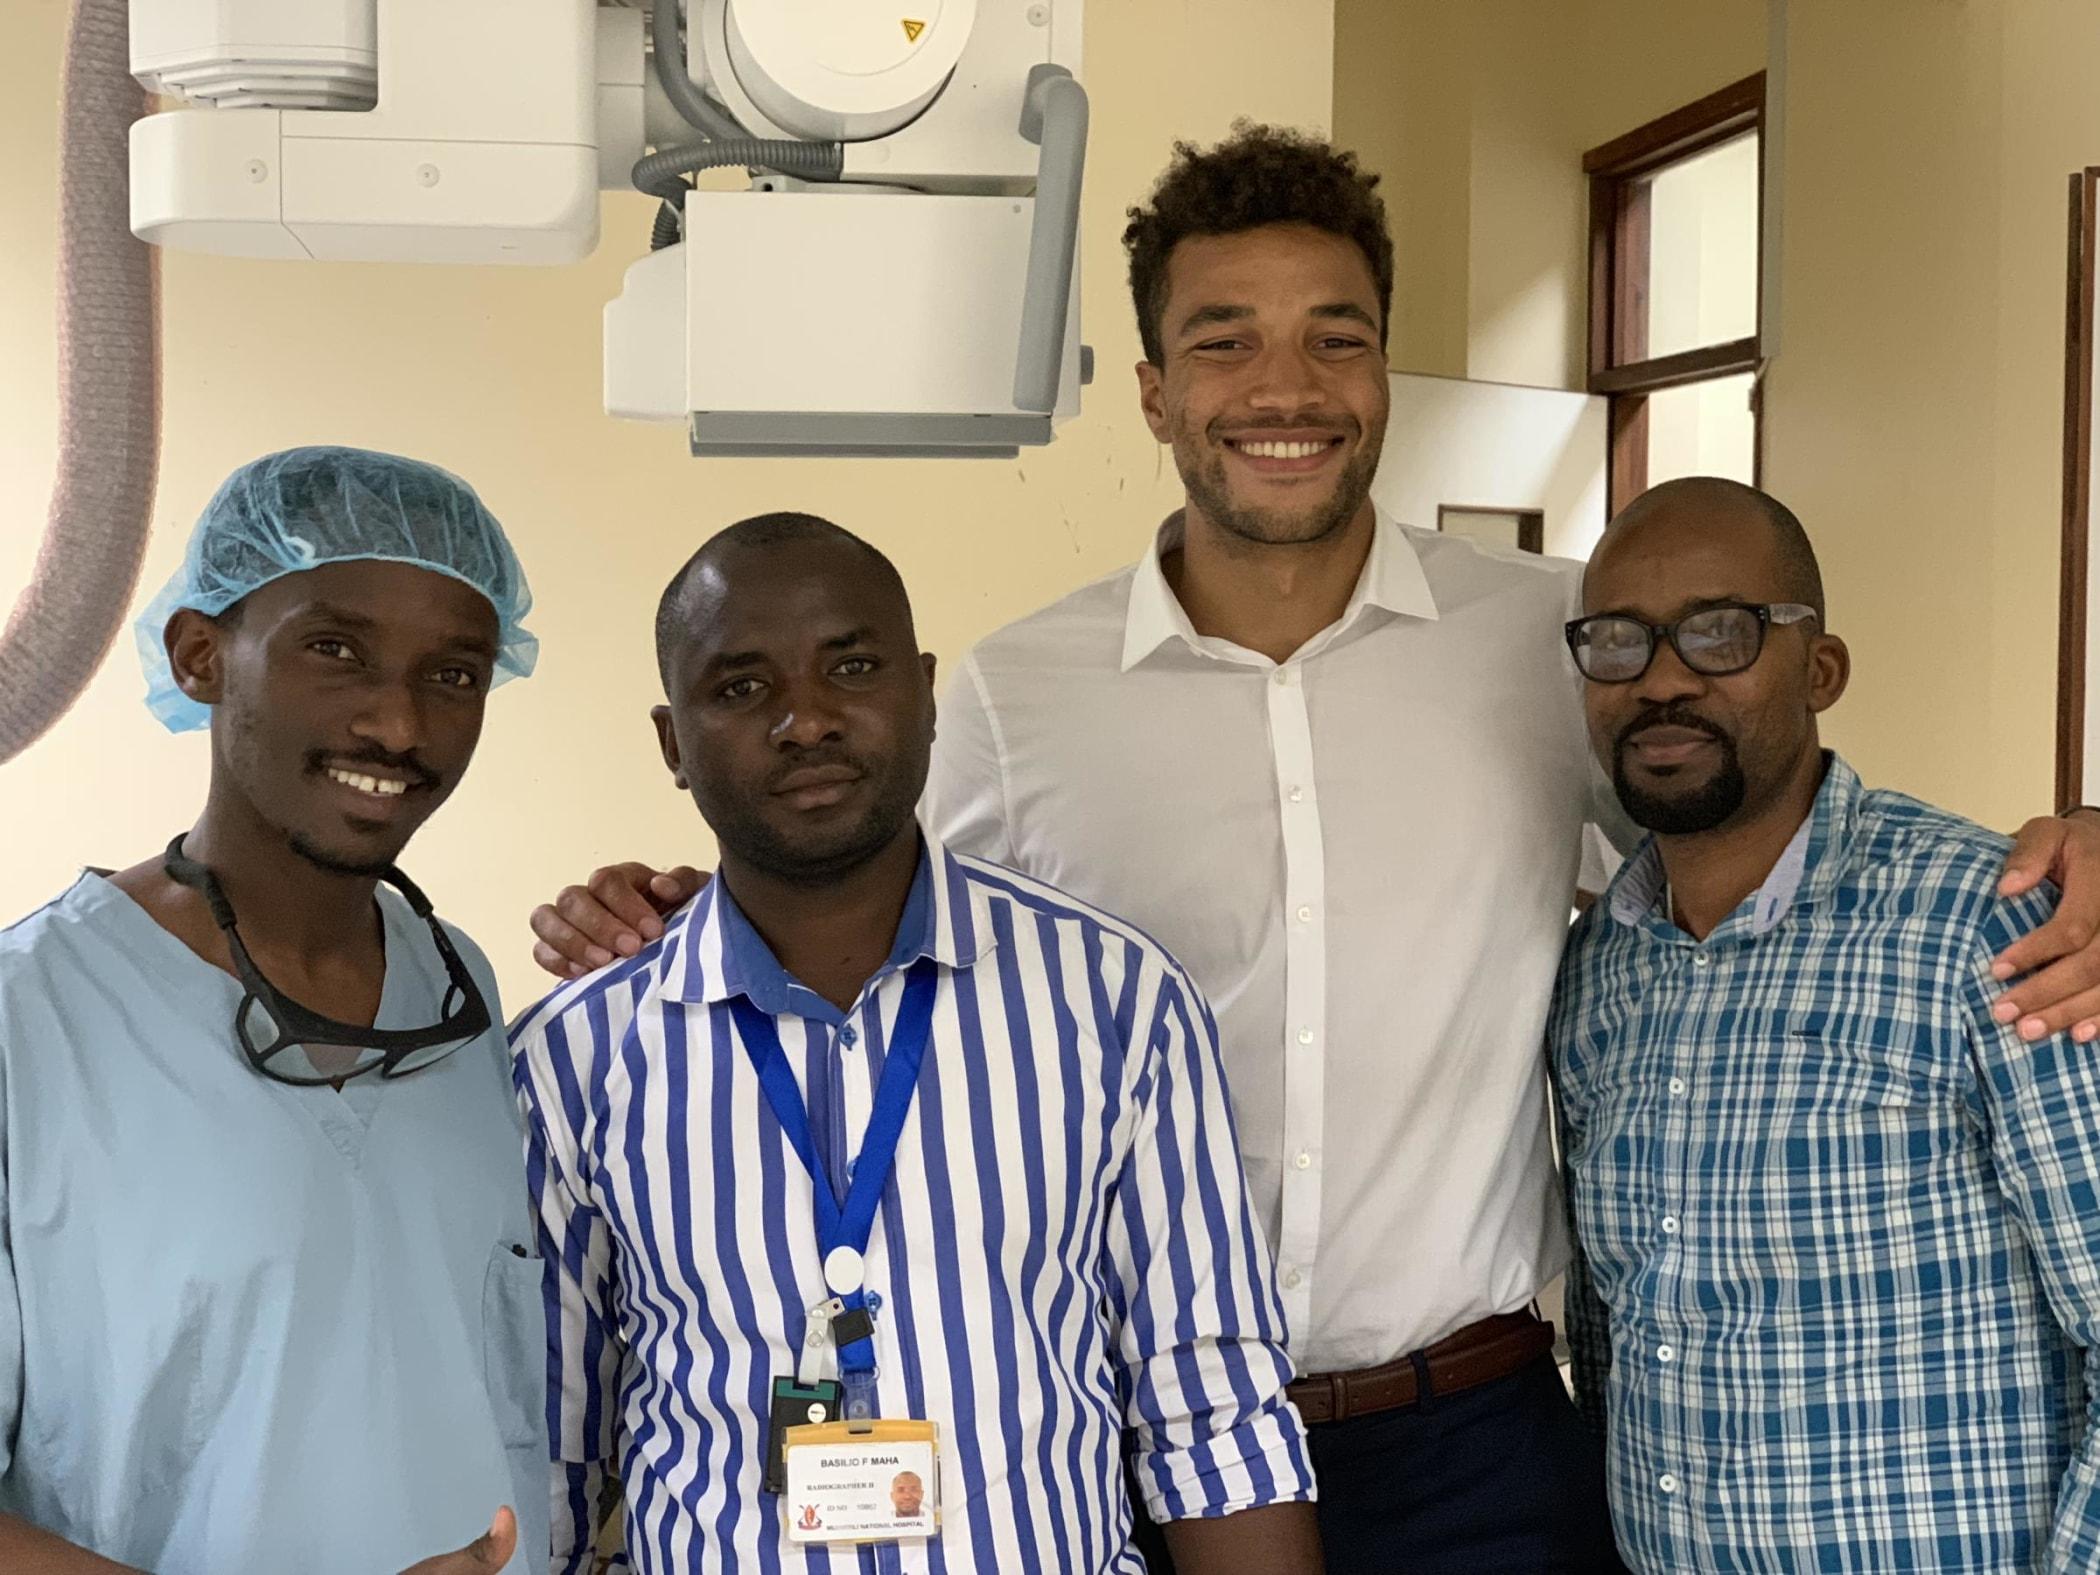 Residents, technologists and medical students working together in IR: Dr. Ivan Rukundo, Basilio Fabian Maha, Jonathan Apasu, and Joseph Kulinga.